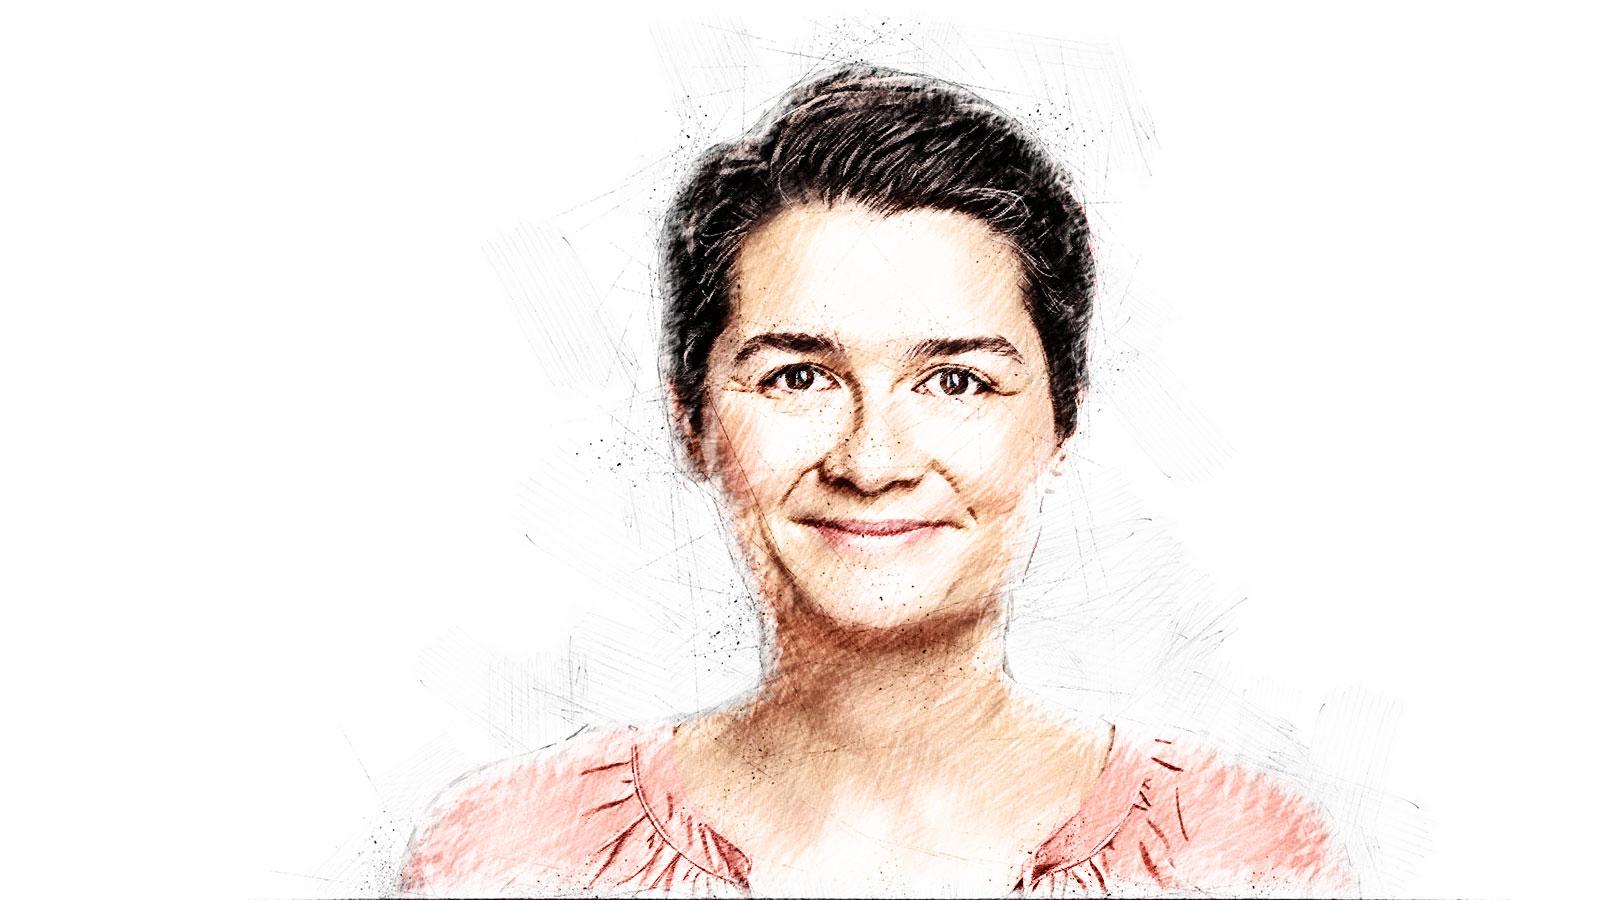 Daniela Kolbe, MiGAZIN, SPD, Politik, Bundestag